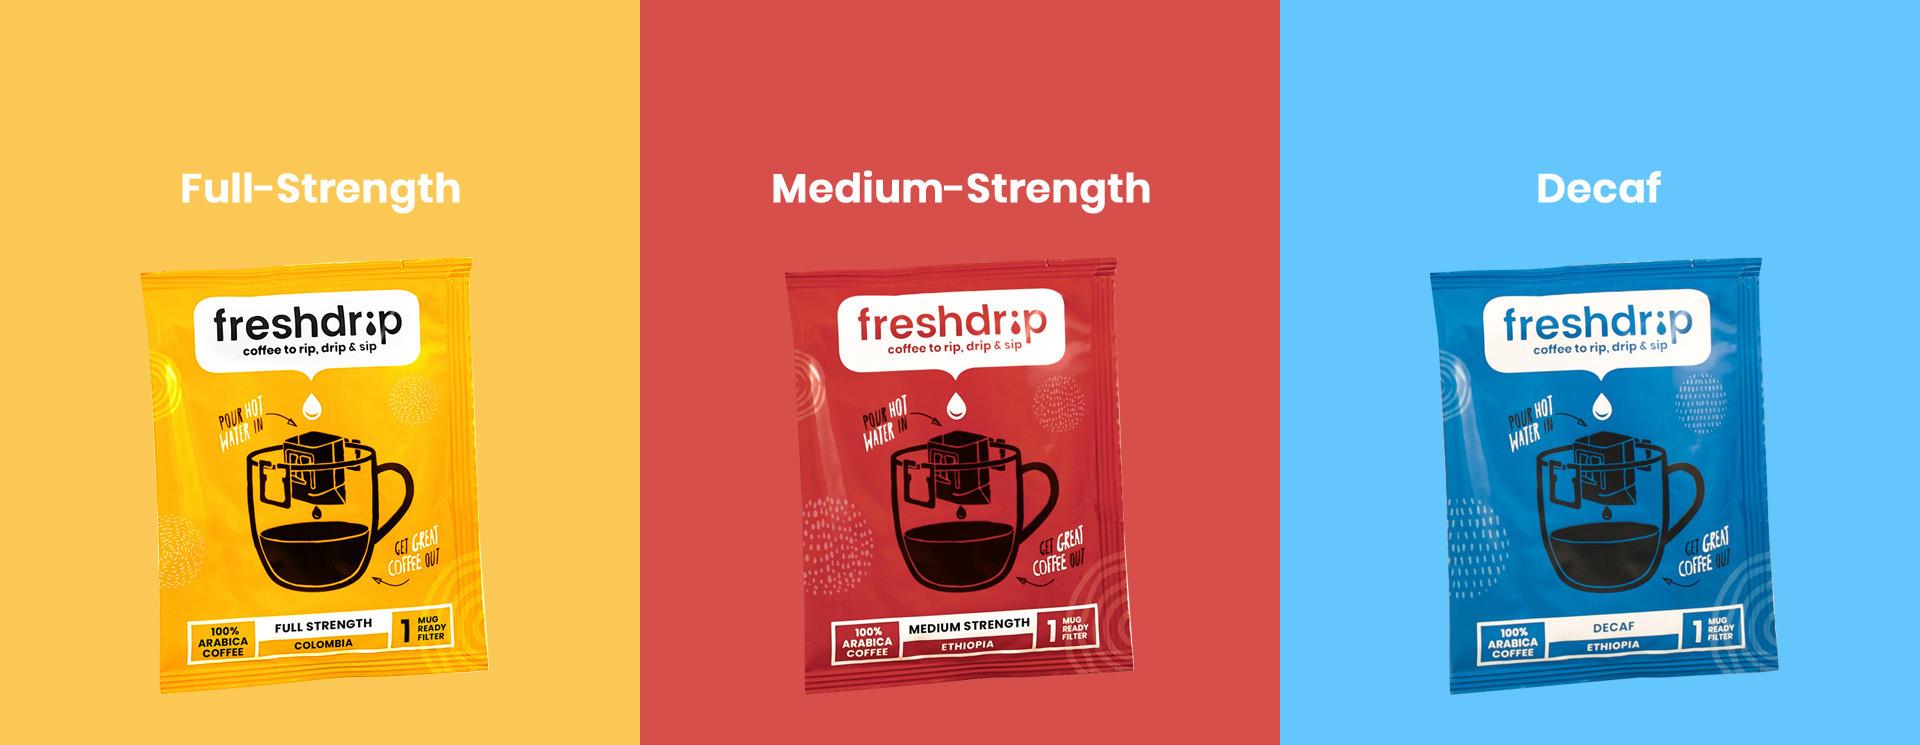 Shop Freshdrip Filter Koffie